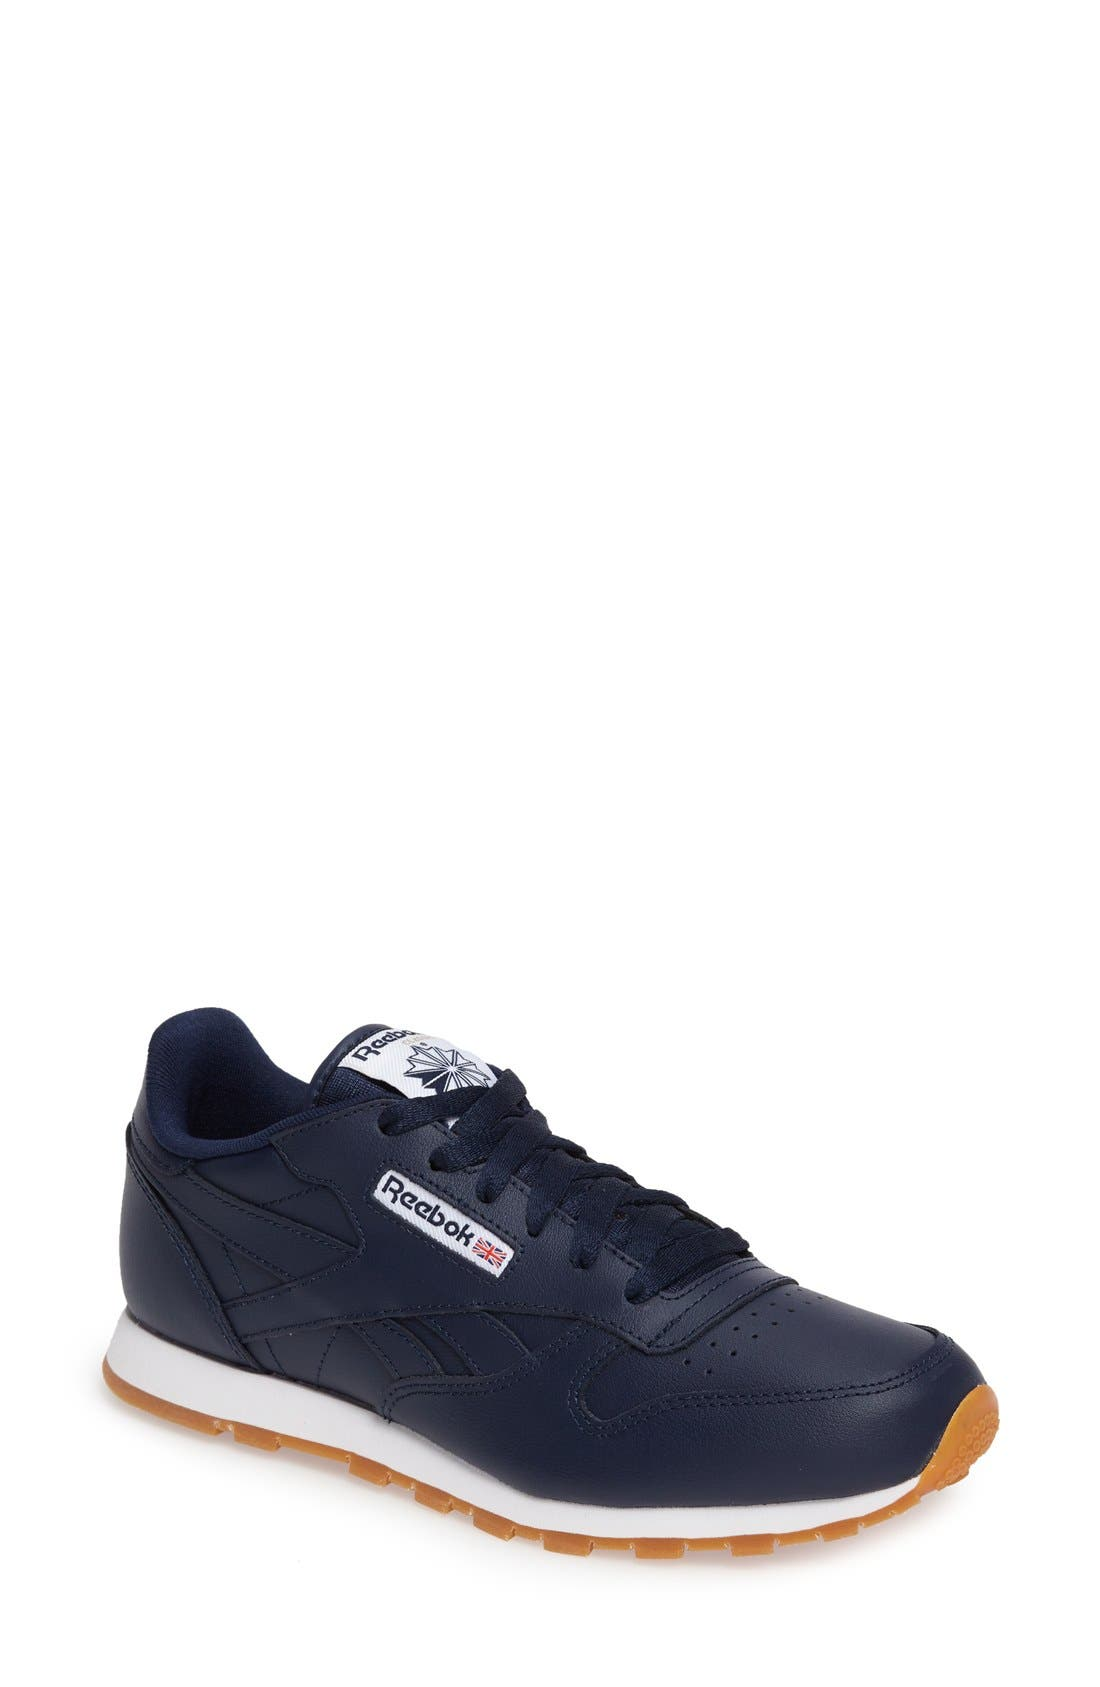 Reebok Classic Sneaker (Big Kid)